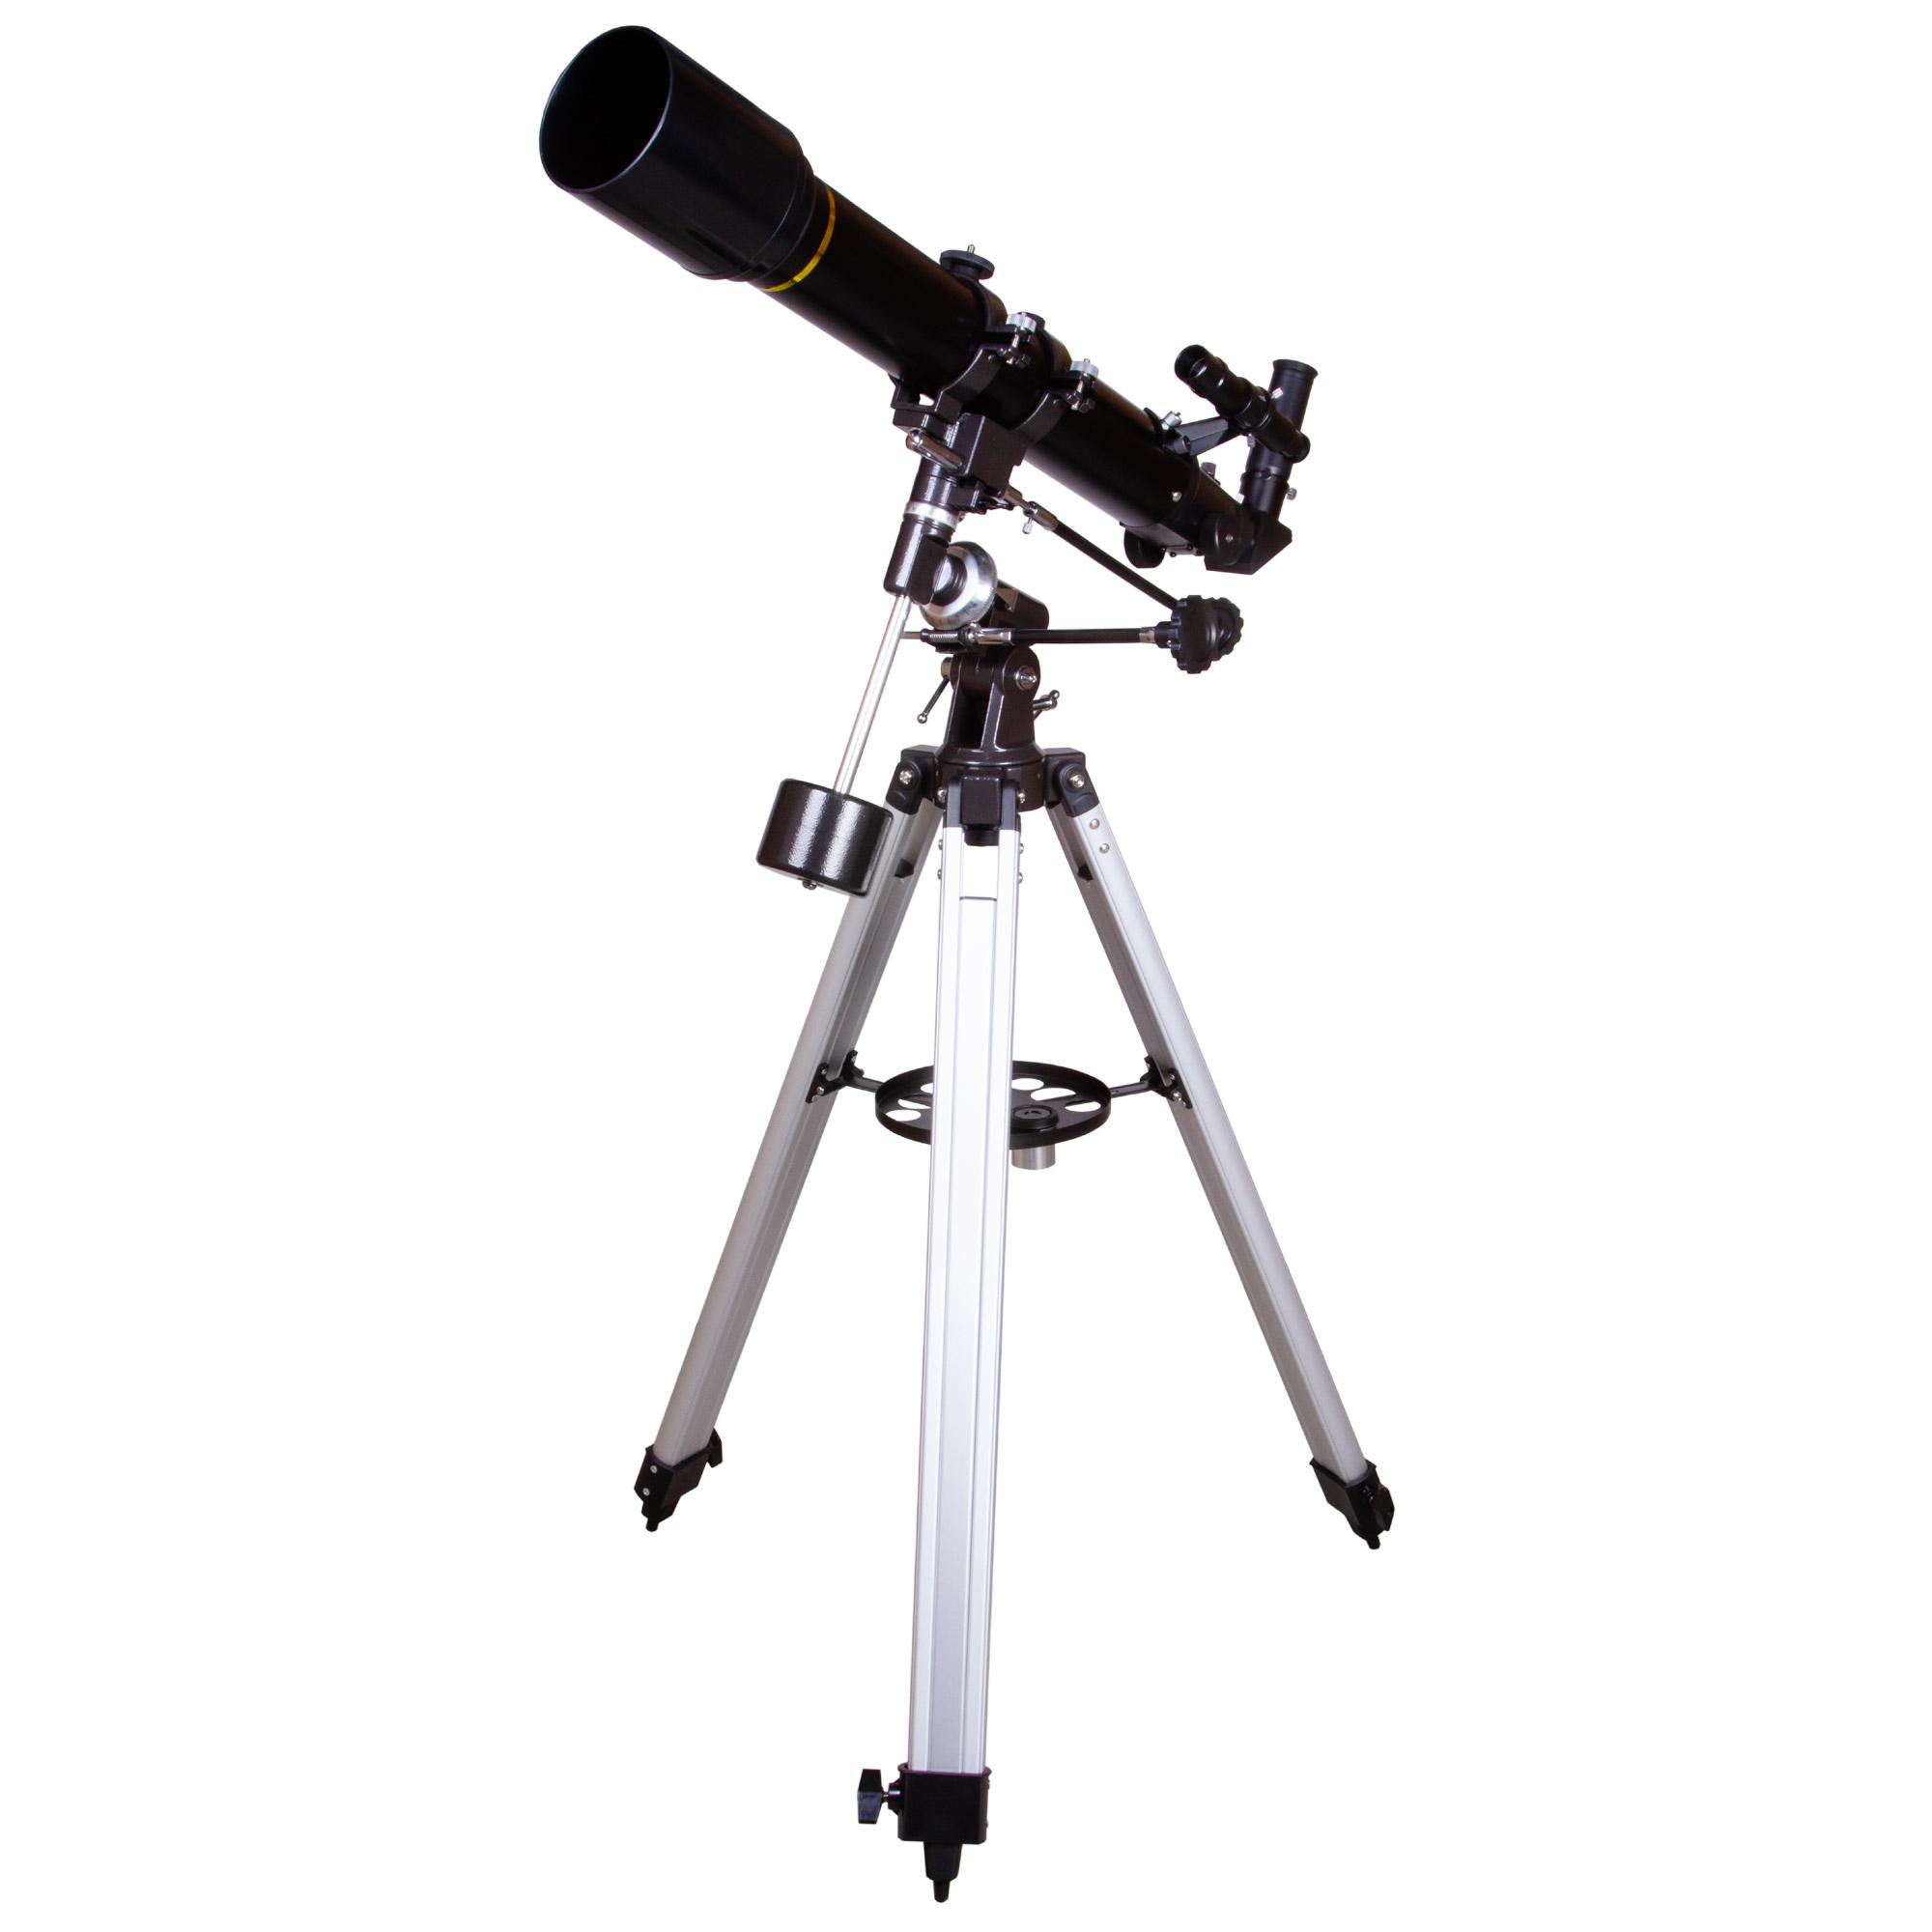 Телескоп Levenhuk Skyline PLUS 70T (+ Книга знаний «Космос. Непустая пустота» в подарок!) цена и фото